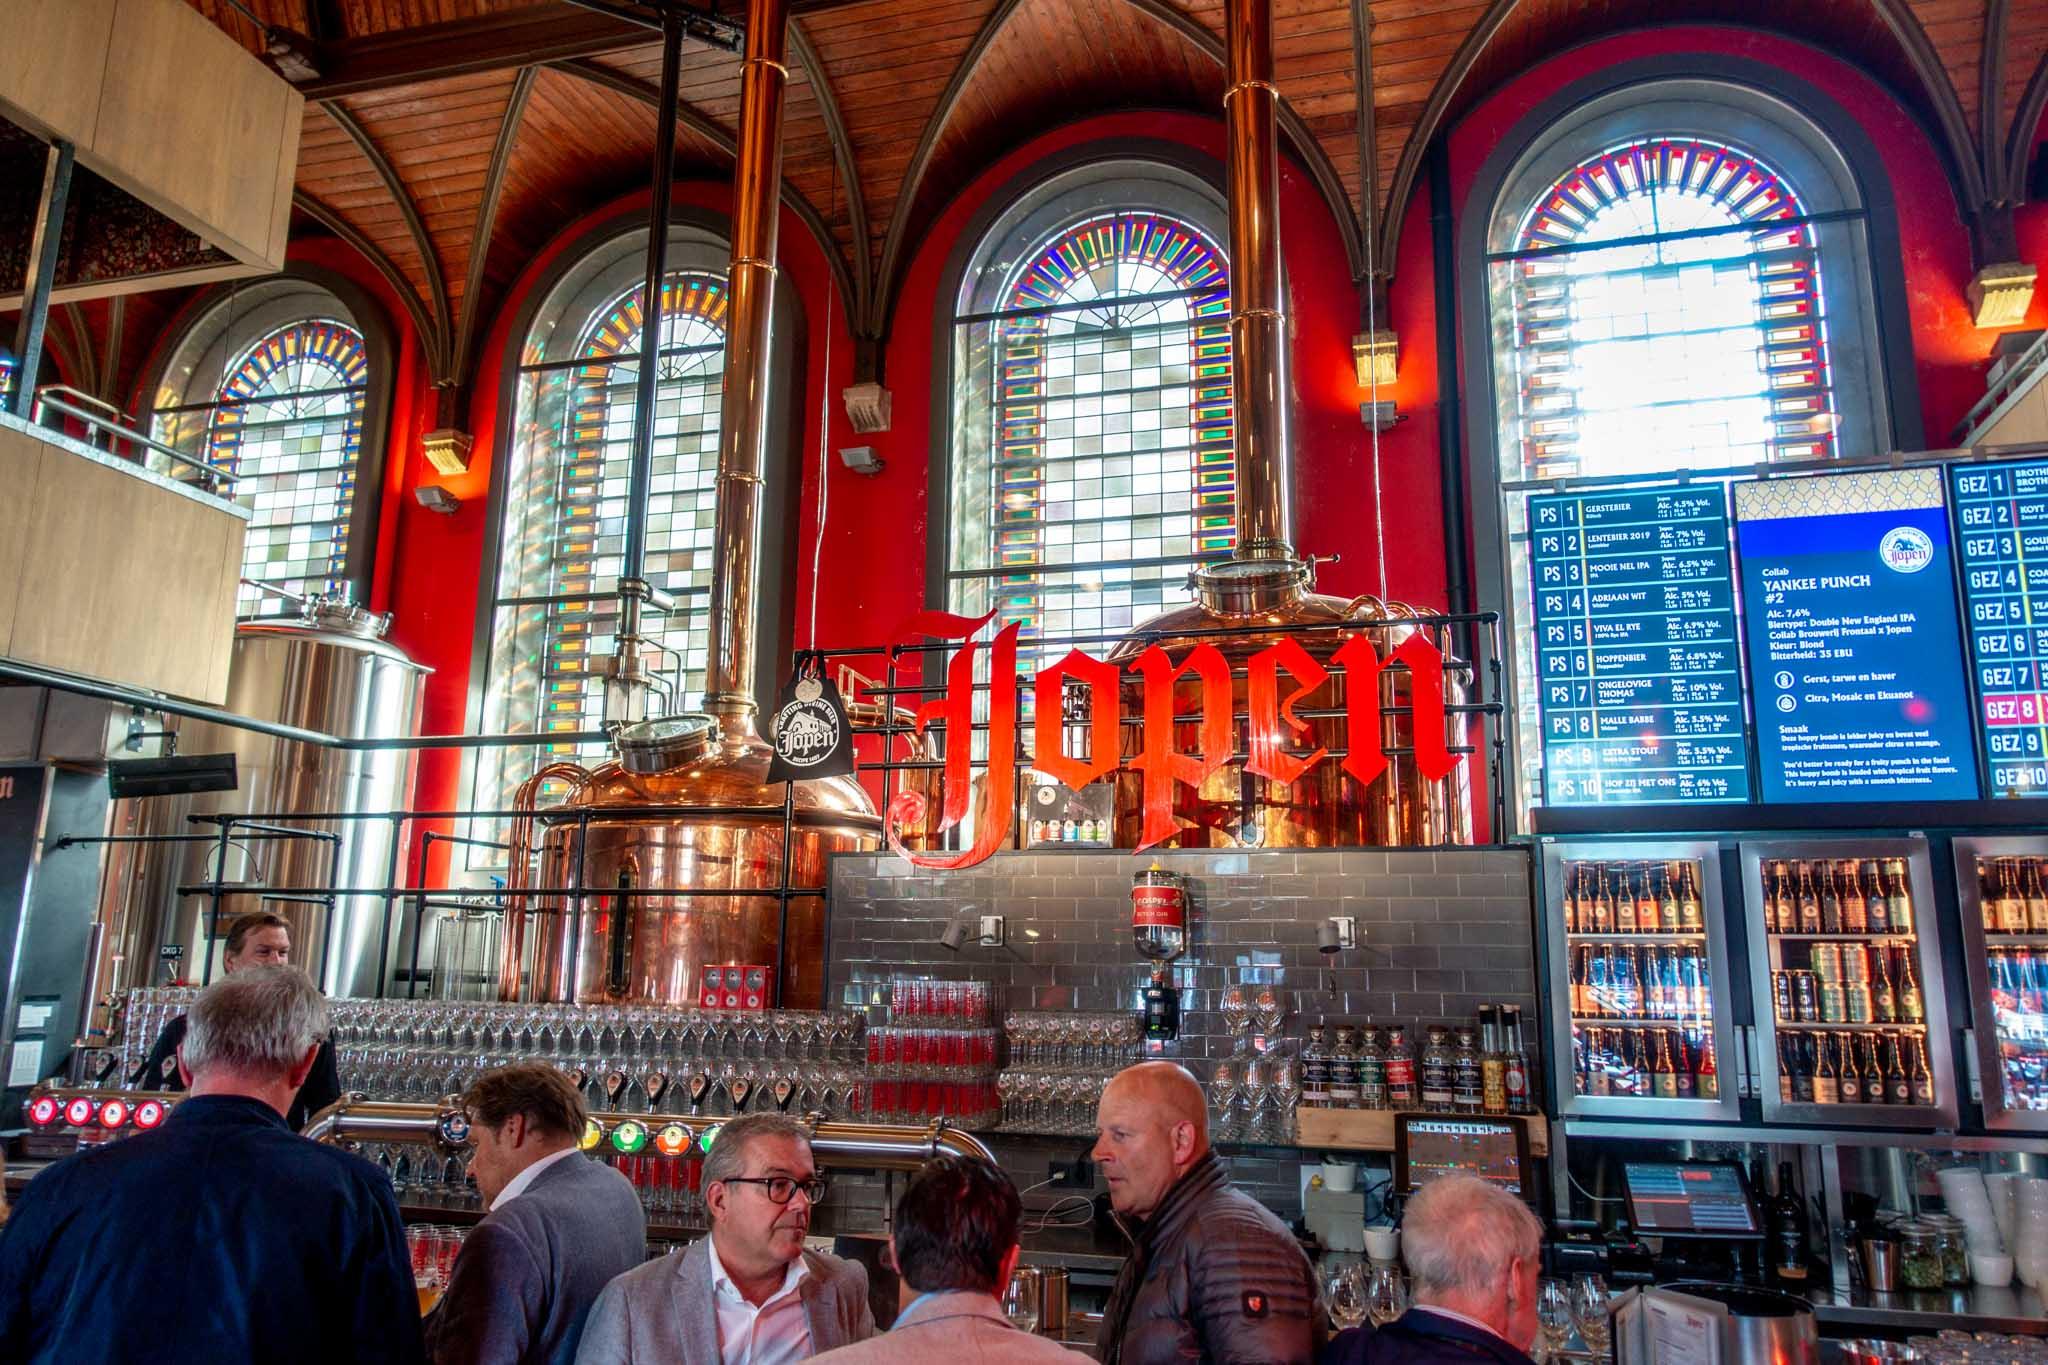 Bar inside a former church transformed into a brewery